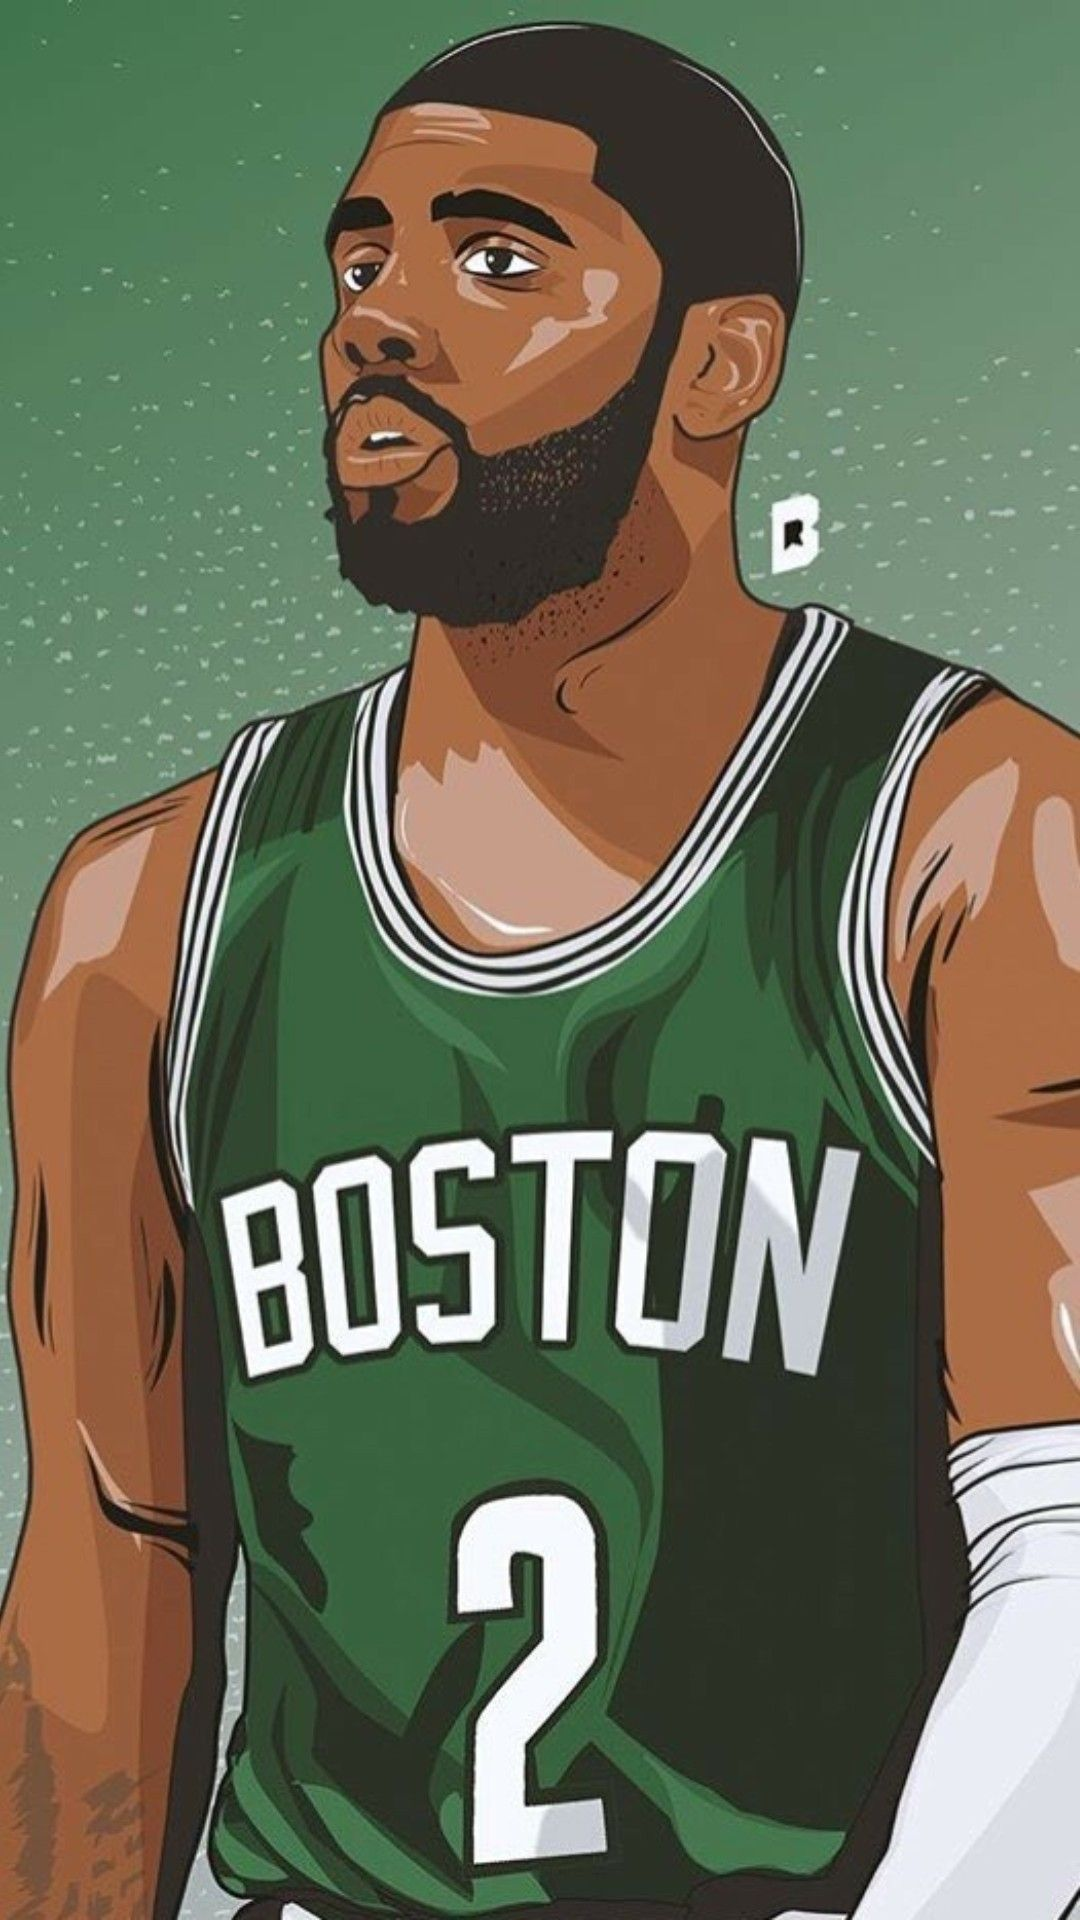 Http Basketballgreatness Myshopify Com Irving Wallpapers Nba Wallpapers Kyrie Irving Celtics